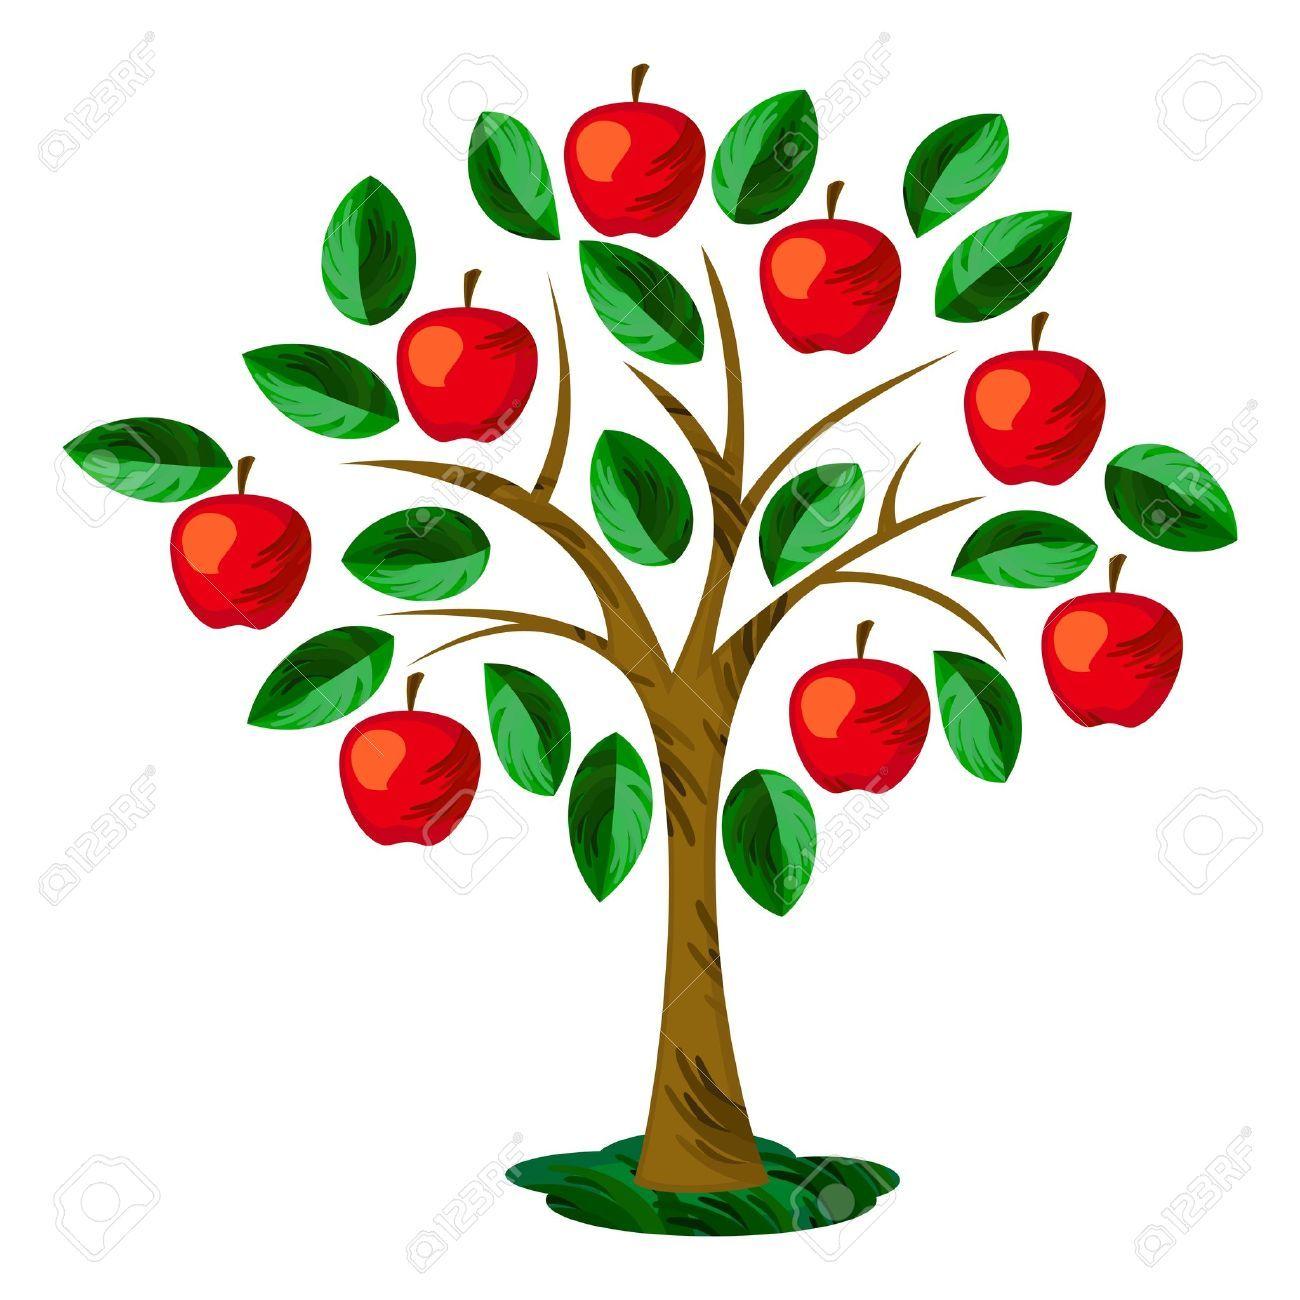 Clipart Crab Apple Tree 2 Crabapple tree, Tree icon